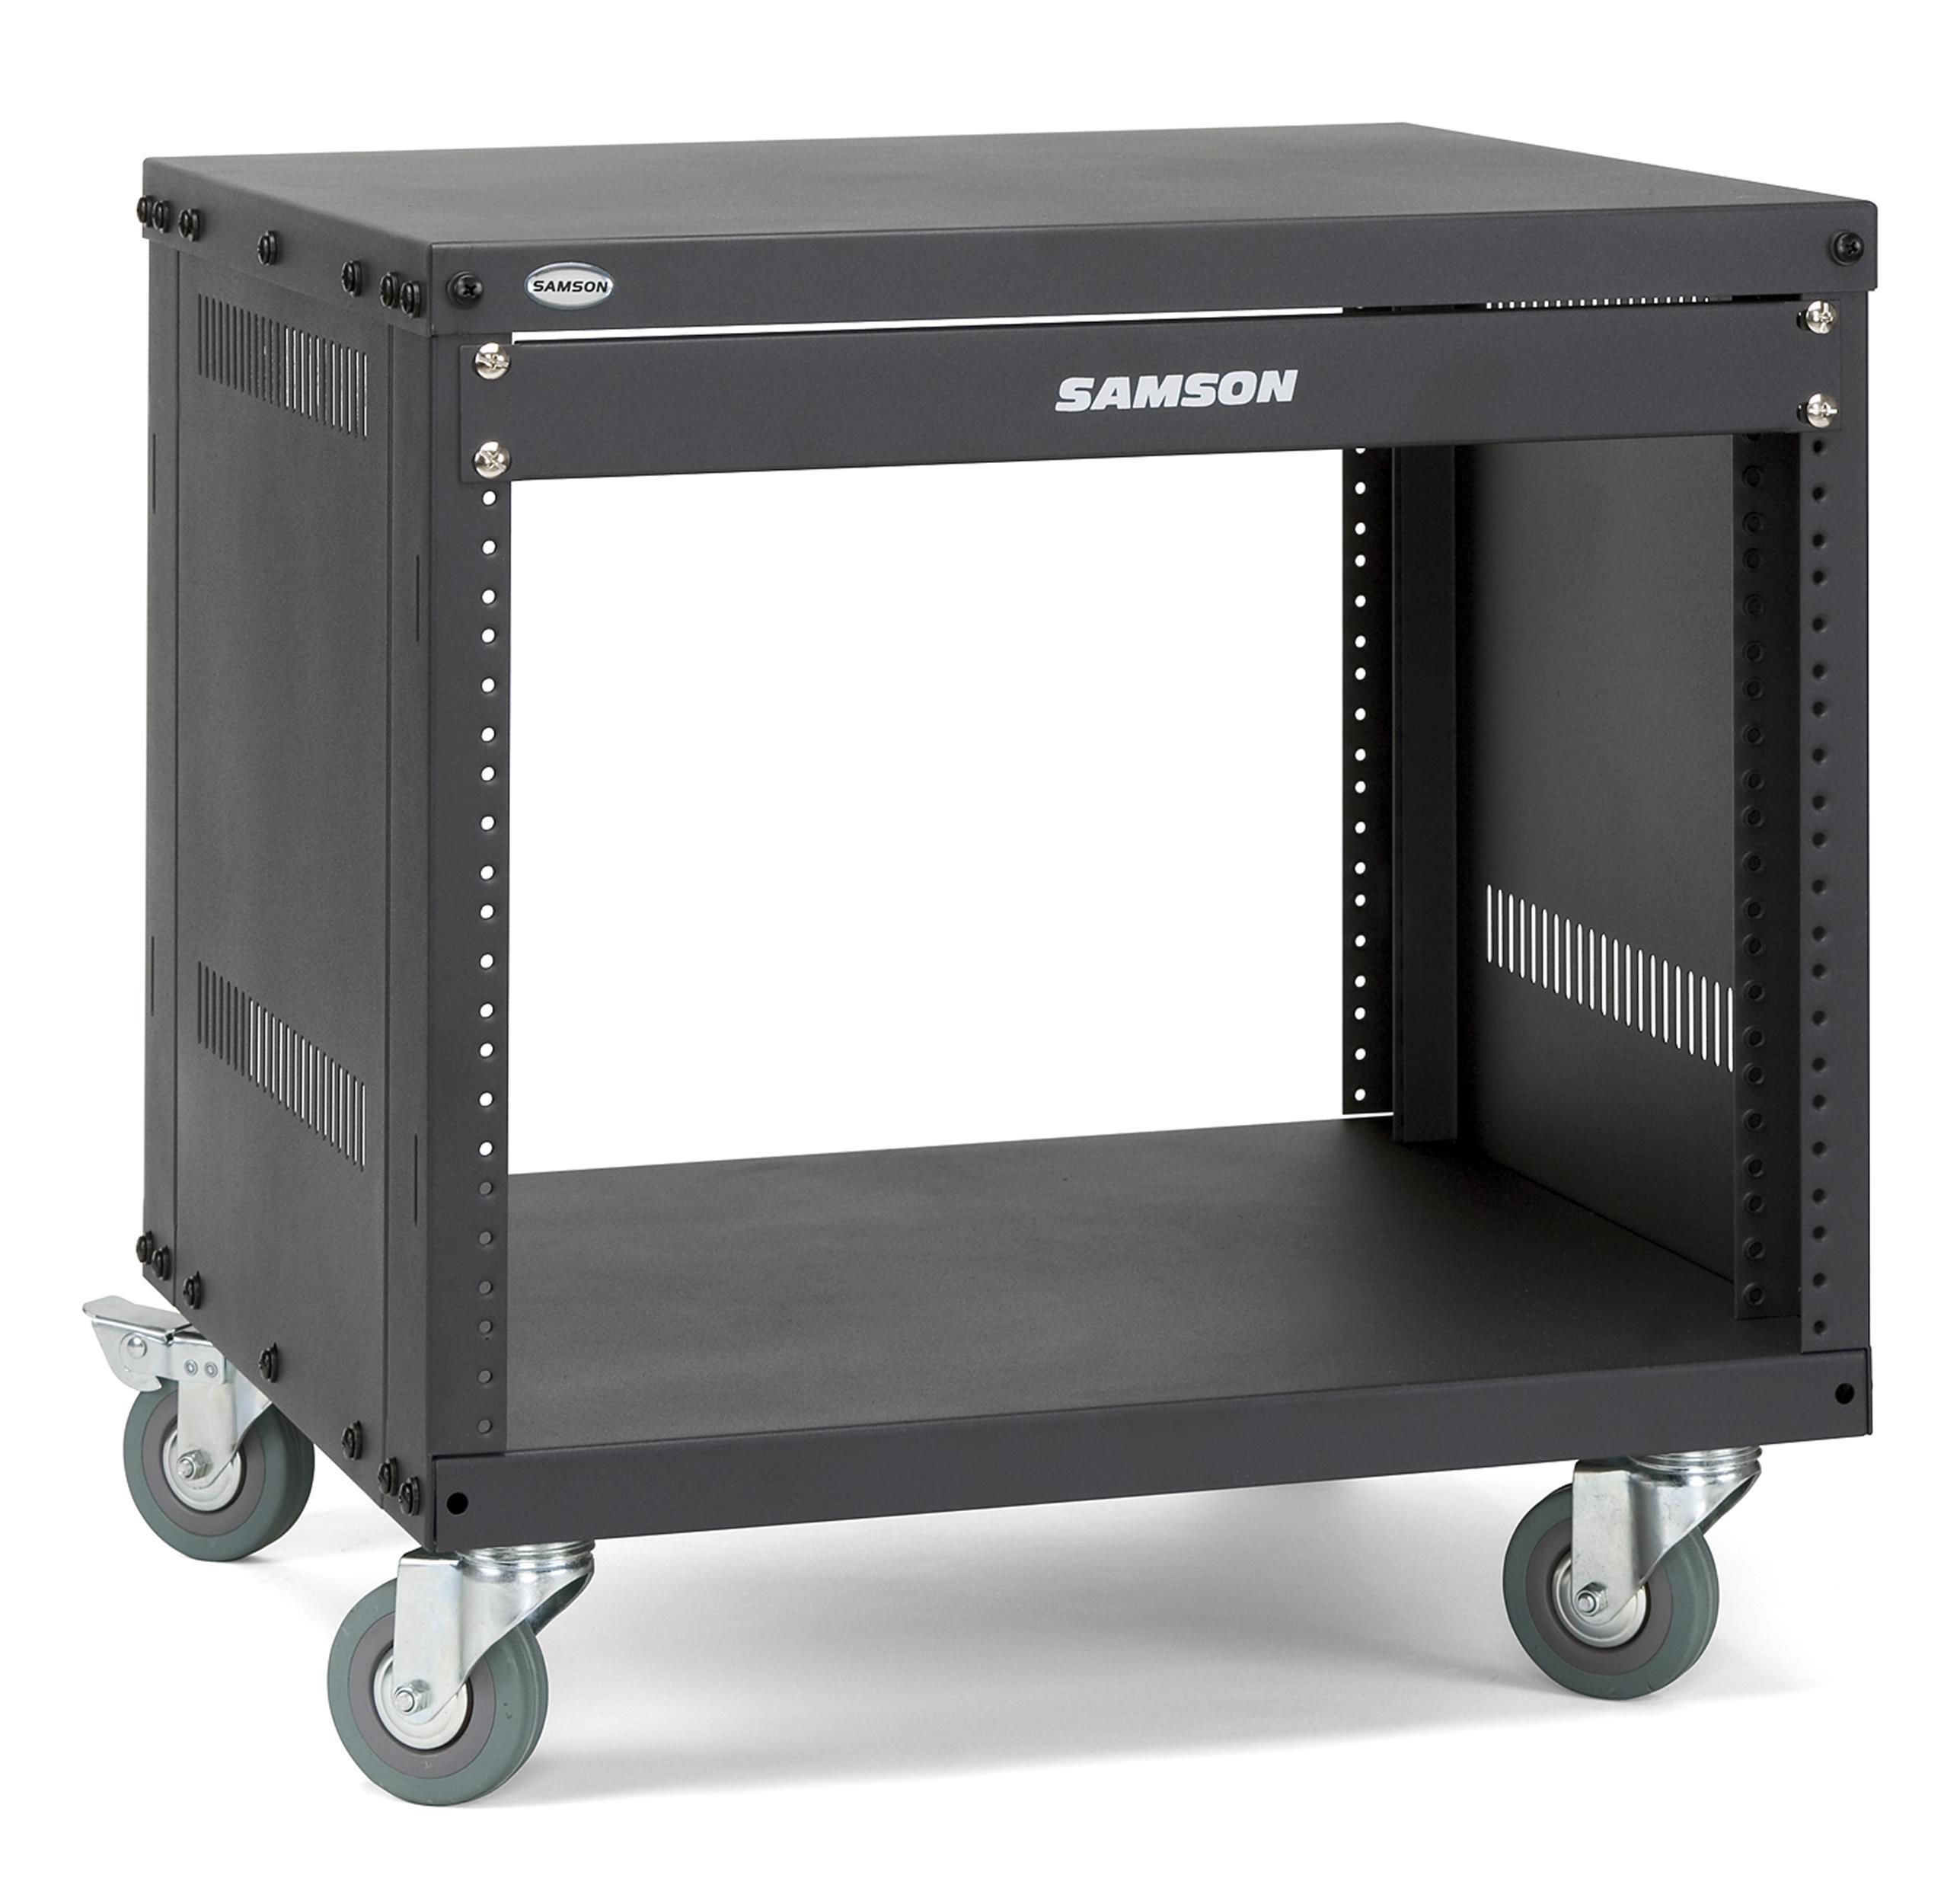 Samson SRKS2U mensola rack a 2 unita